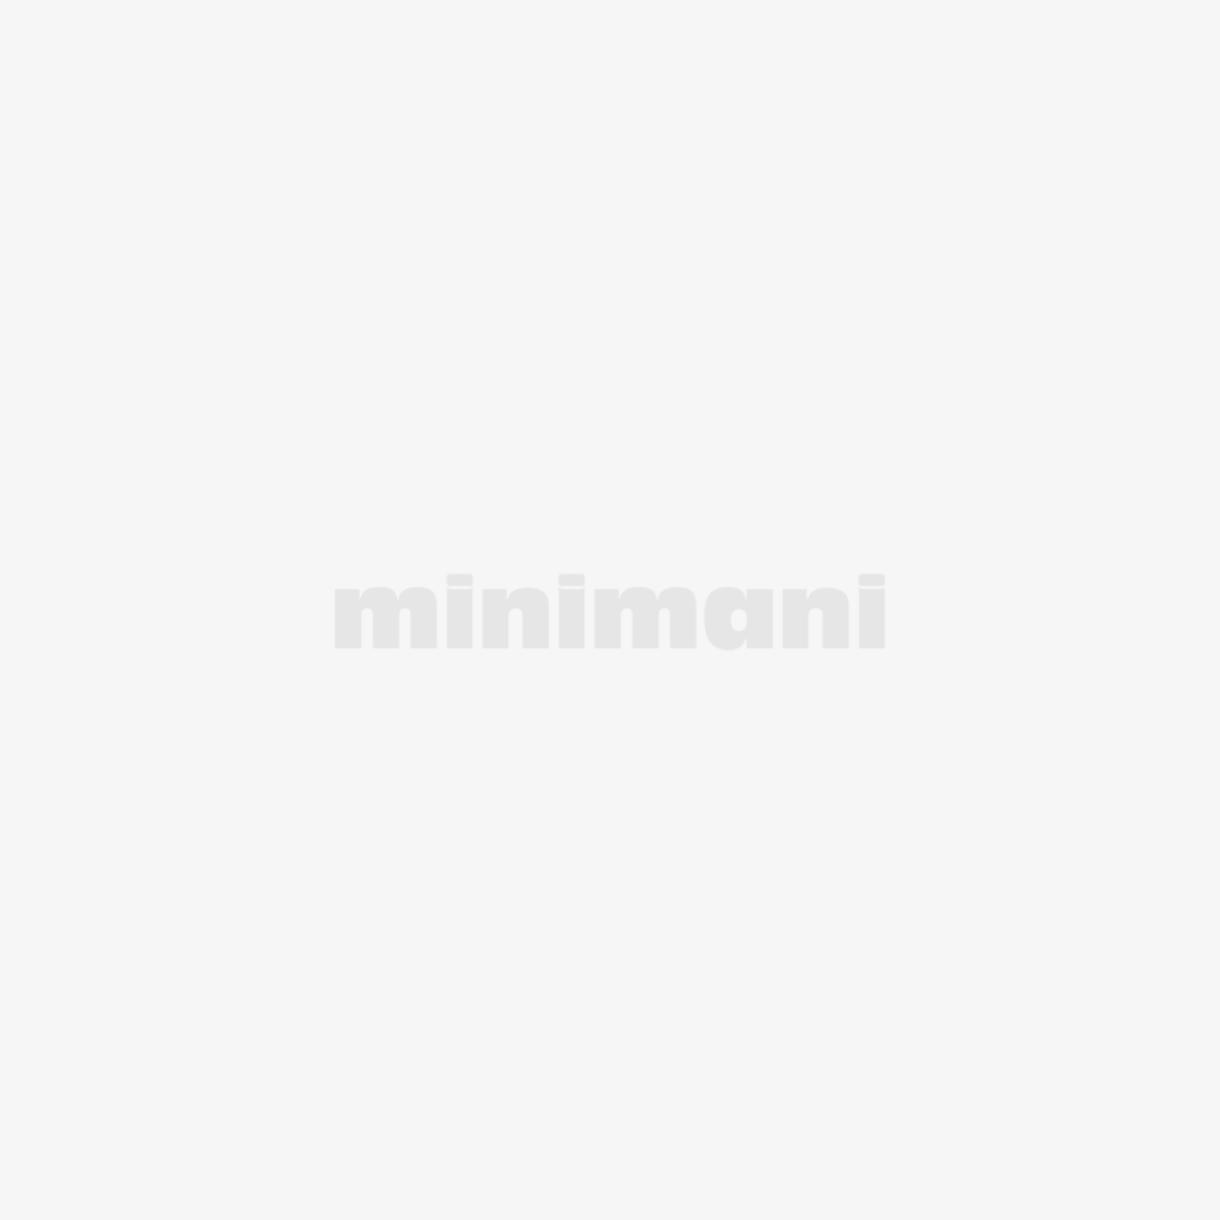 Vallila verhokappa 60x250cm, Jaffa musta